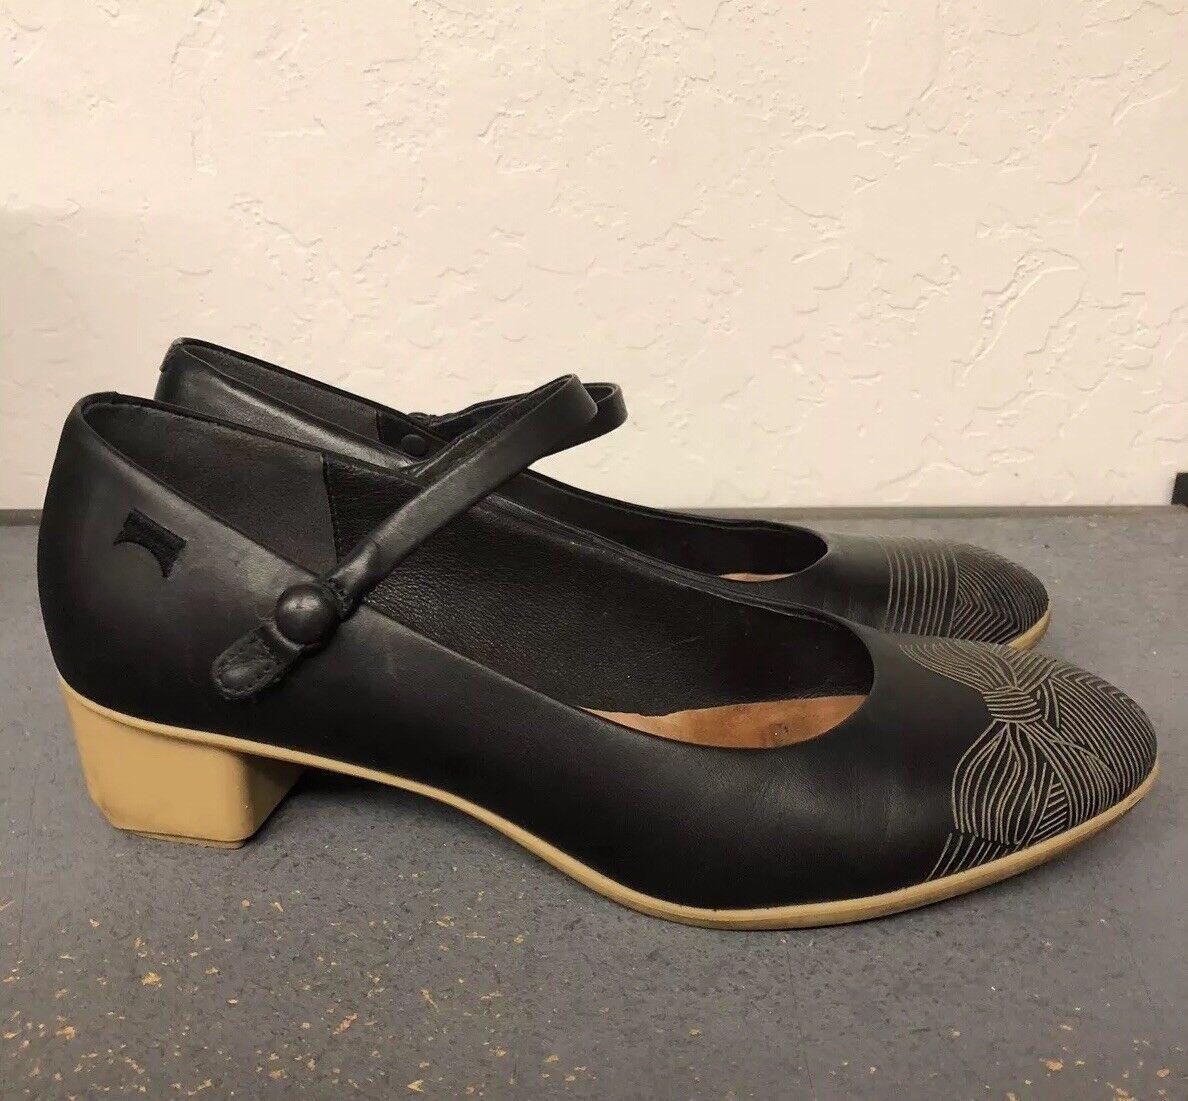 CAMPER Twins Leather Black Etched Stripes Bow High Heels Heels Heels Pumps Sz 37 Geometric 7 199d5f